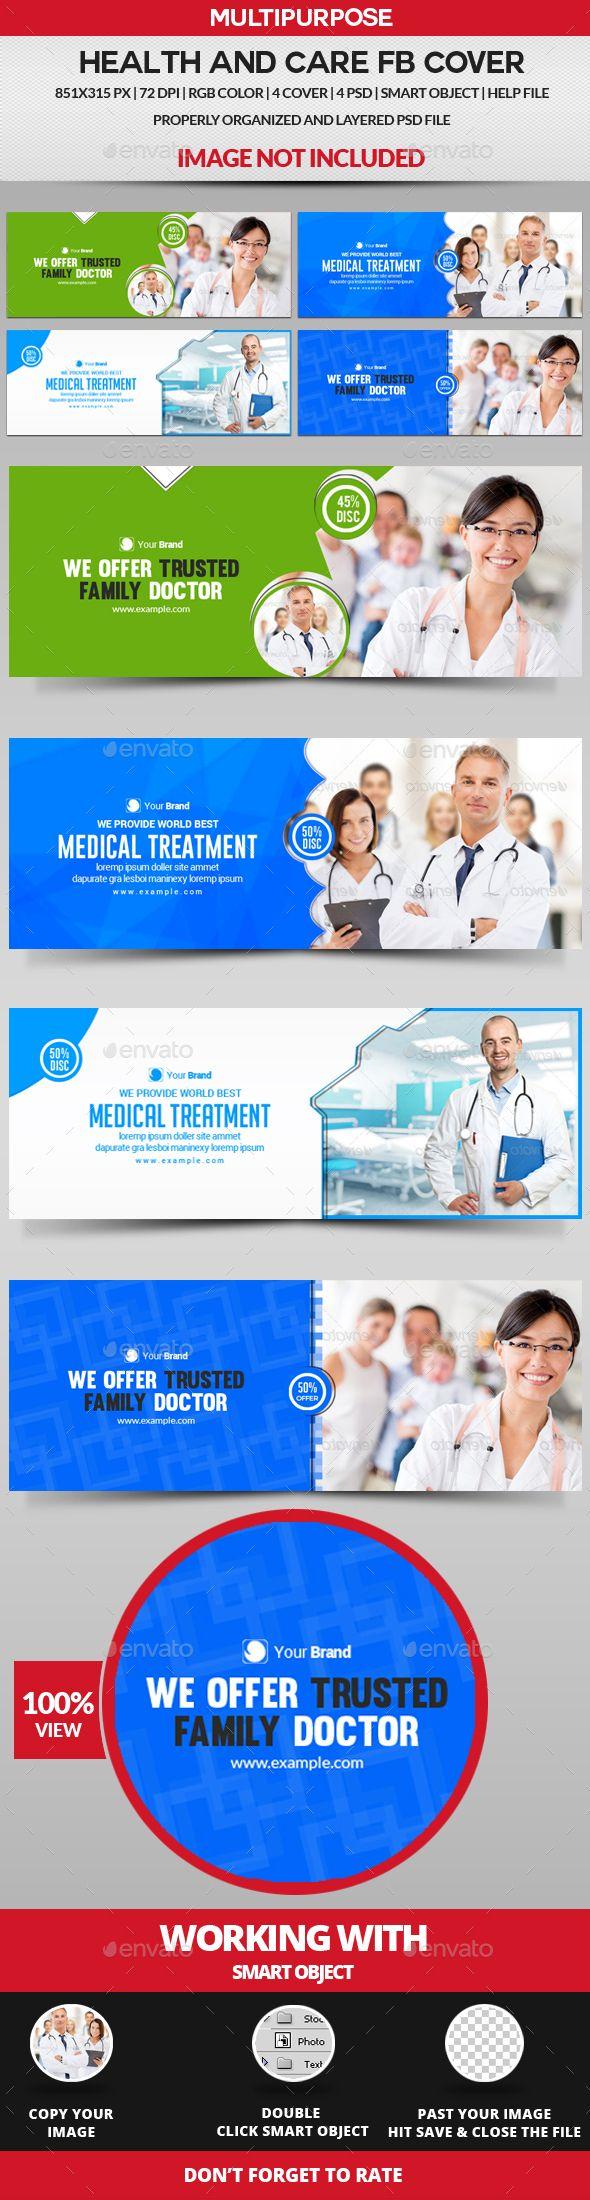 Health Care Facebook Cover - Facebook Timeline Covers Social Media